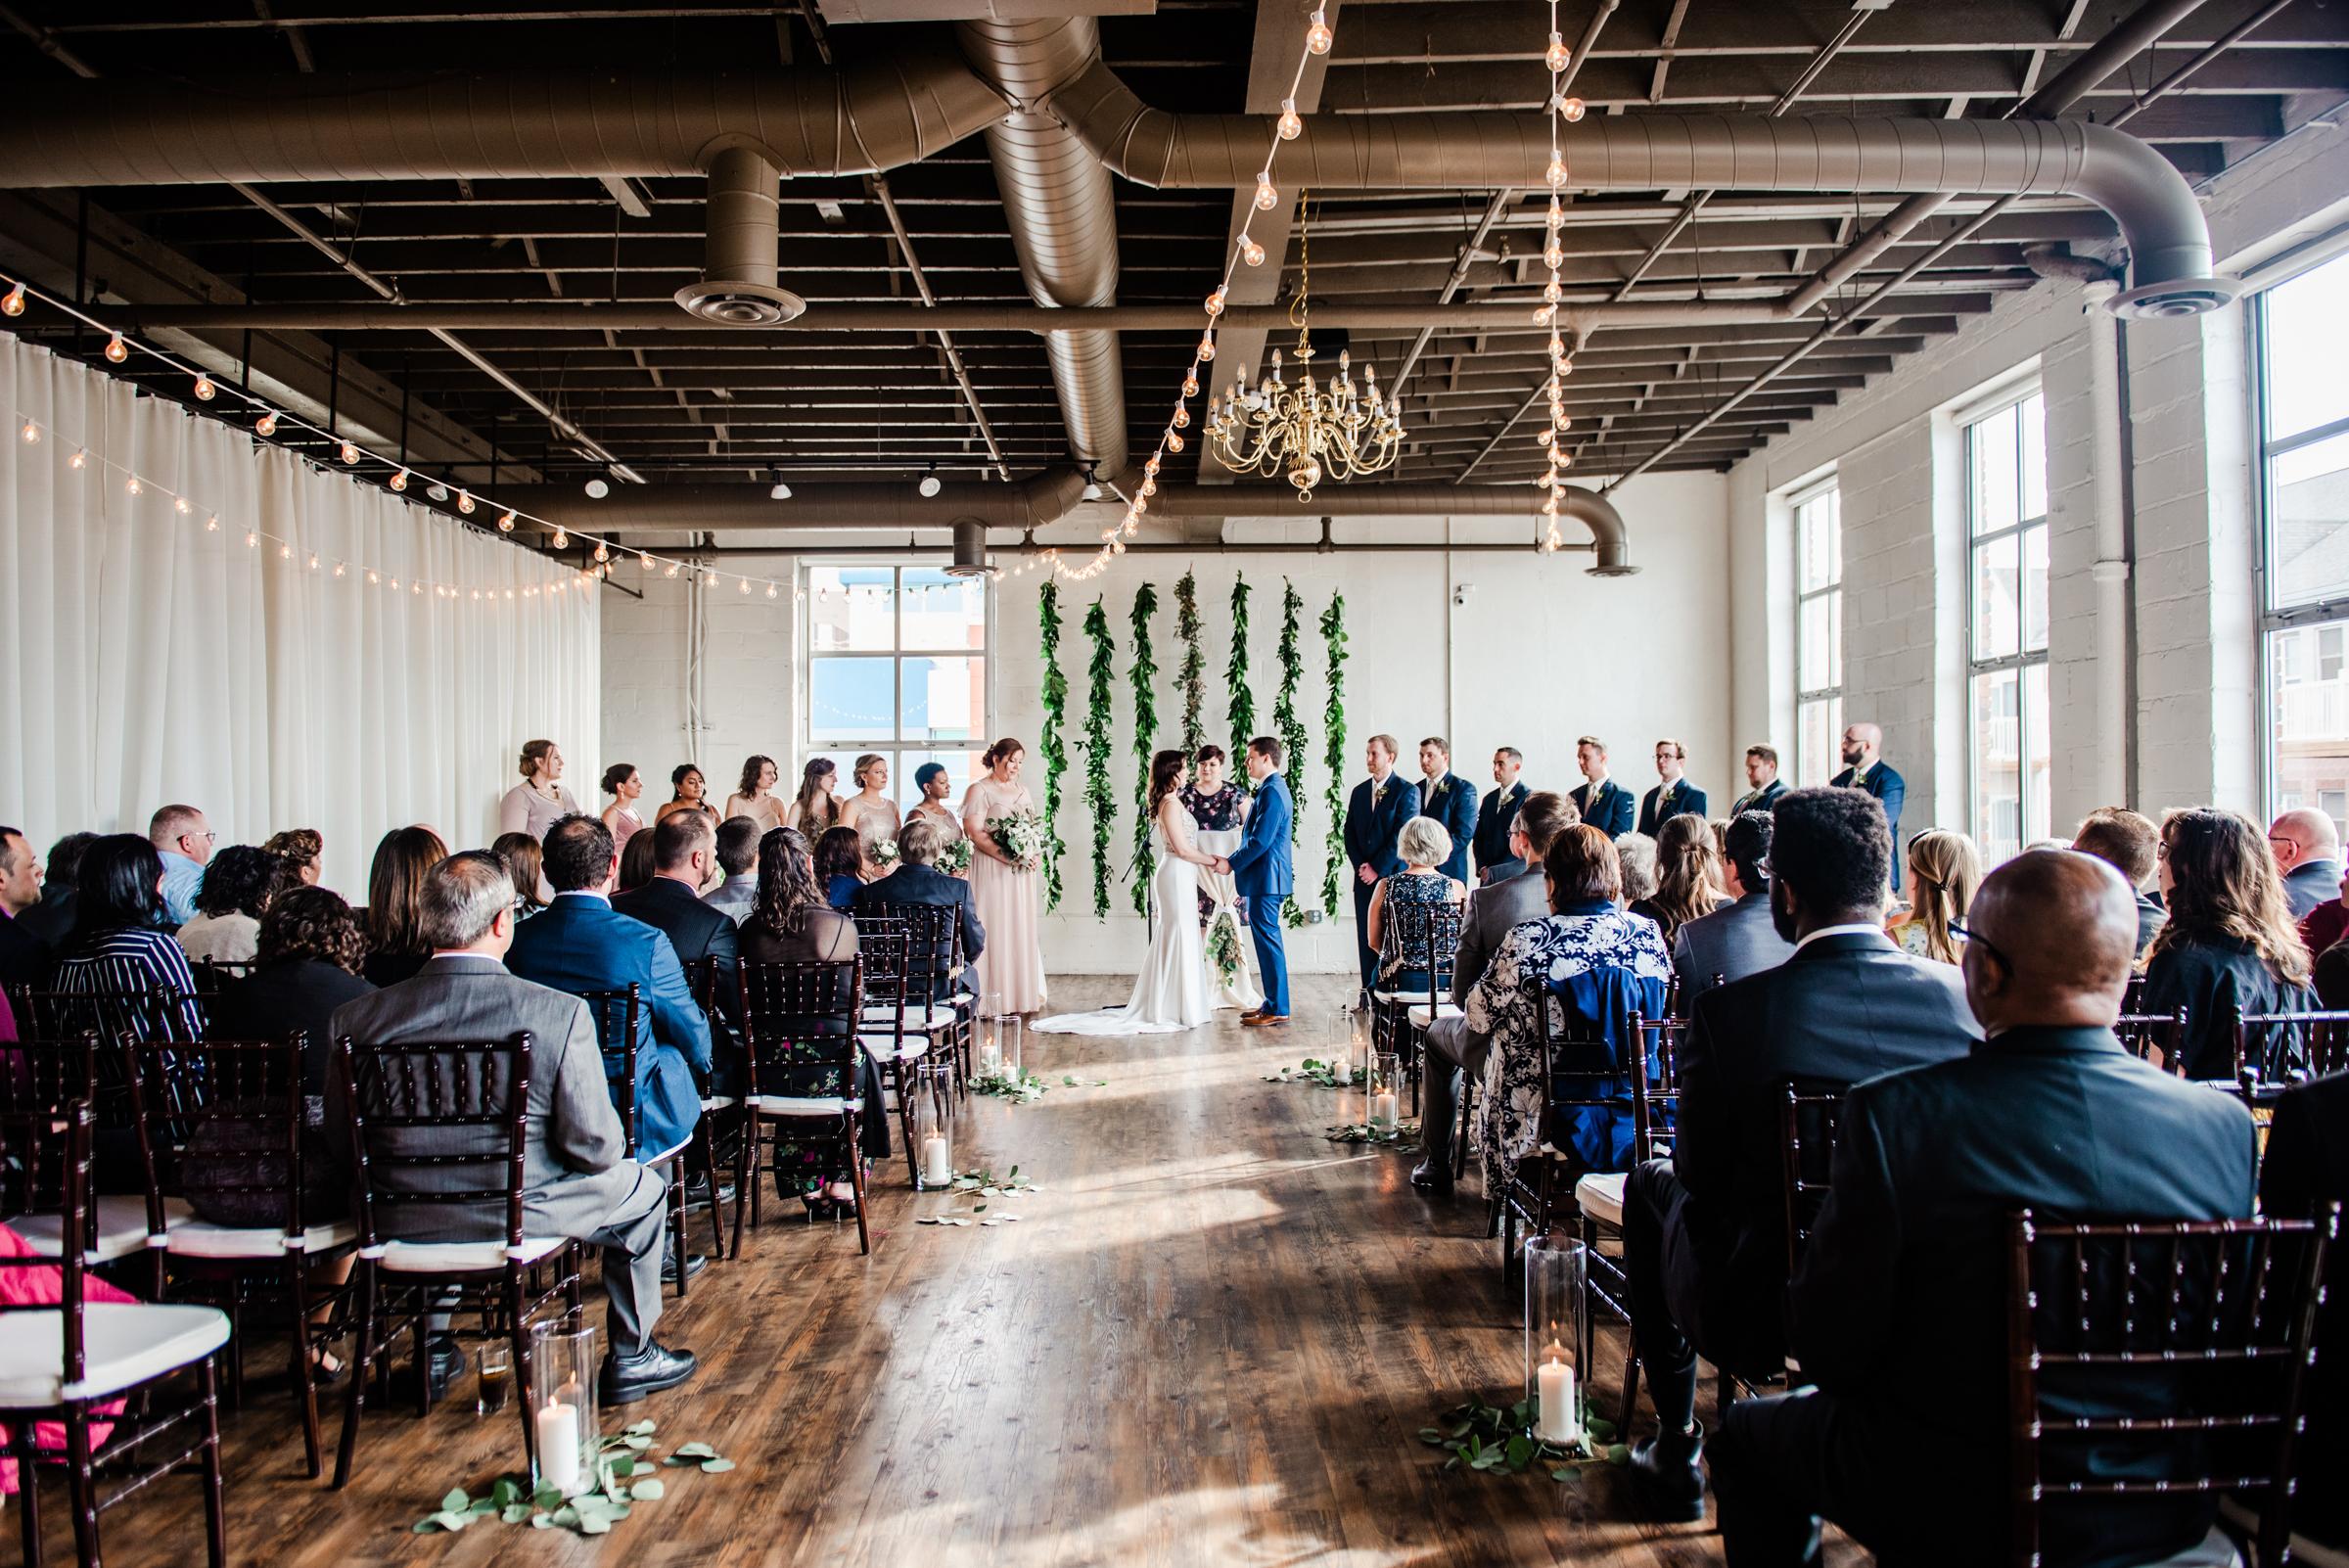 The_Arbor_LoftRochester_Wedding_JILL_STUDIO_Rochester_NY_Photographer_170702.jpg